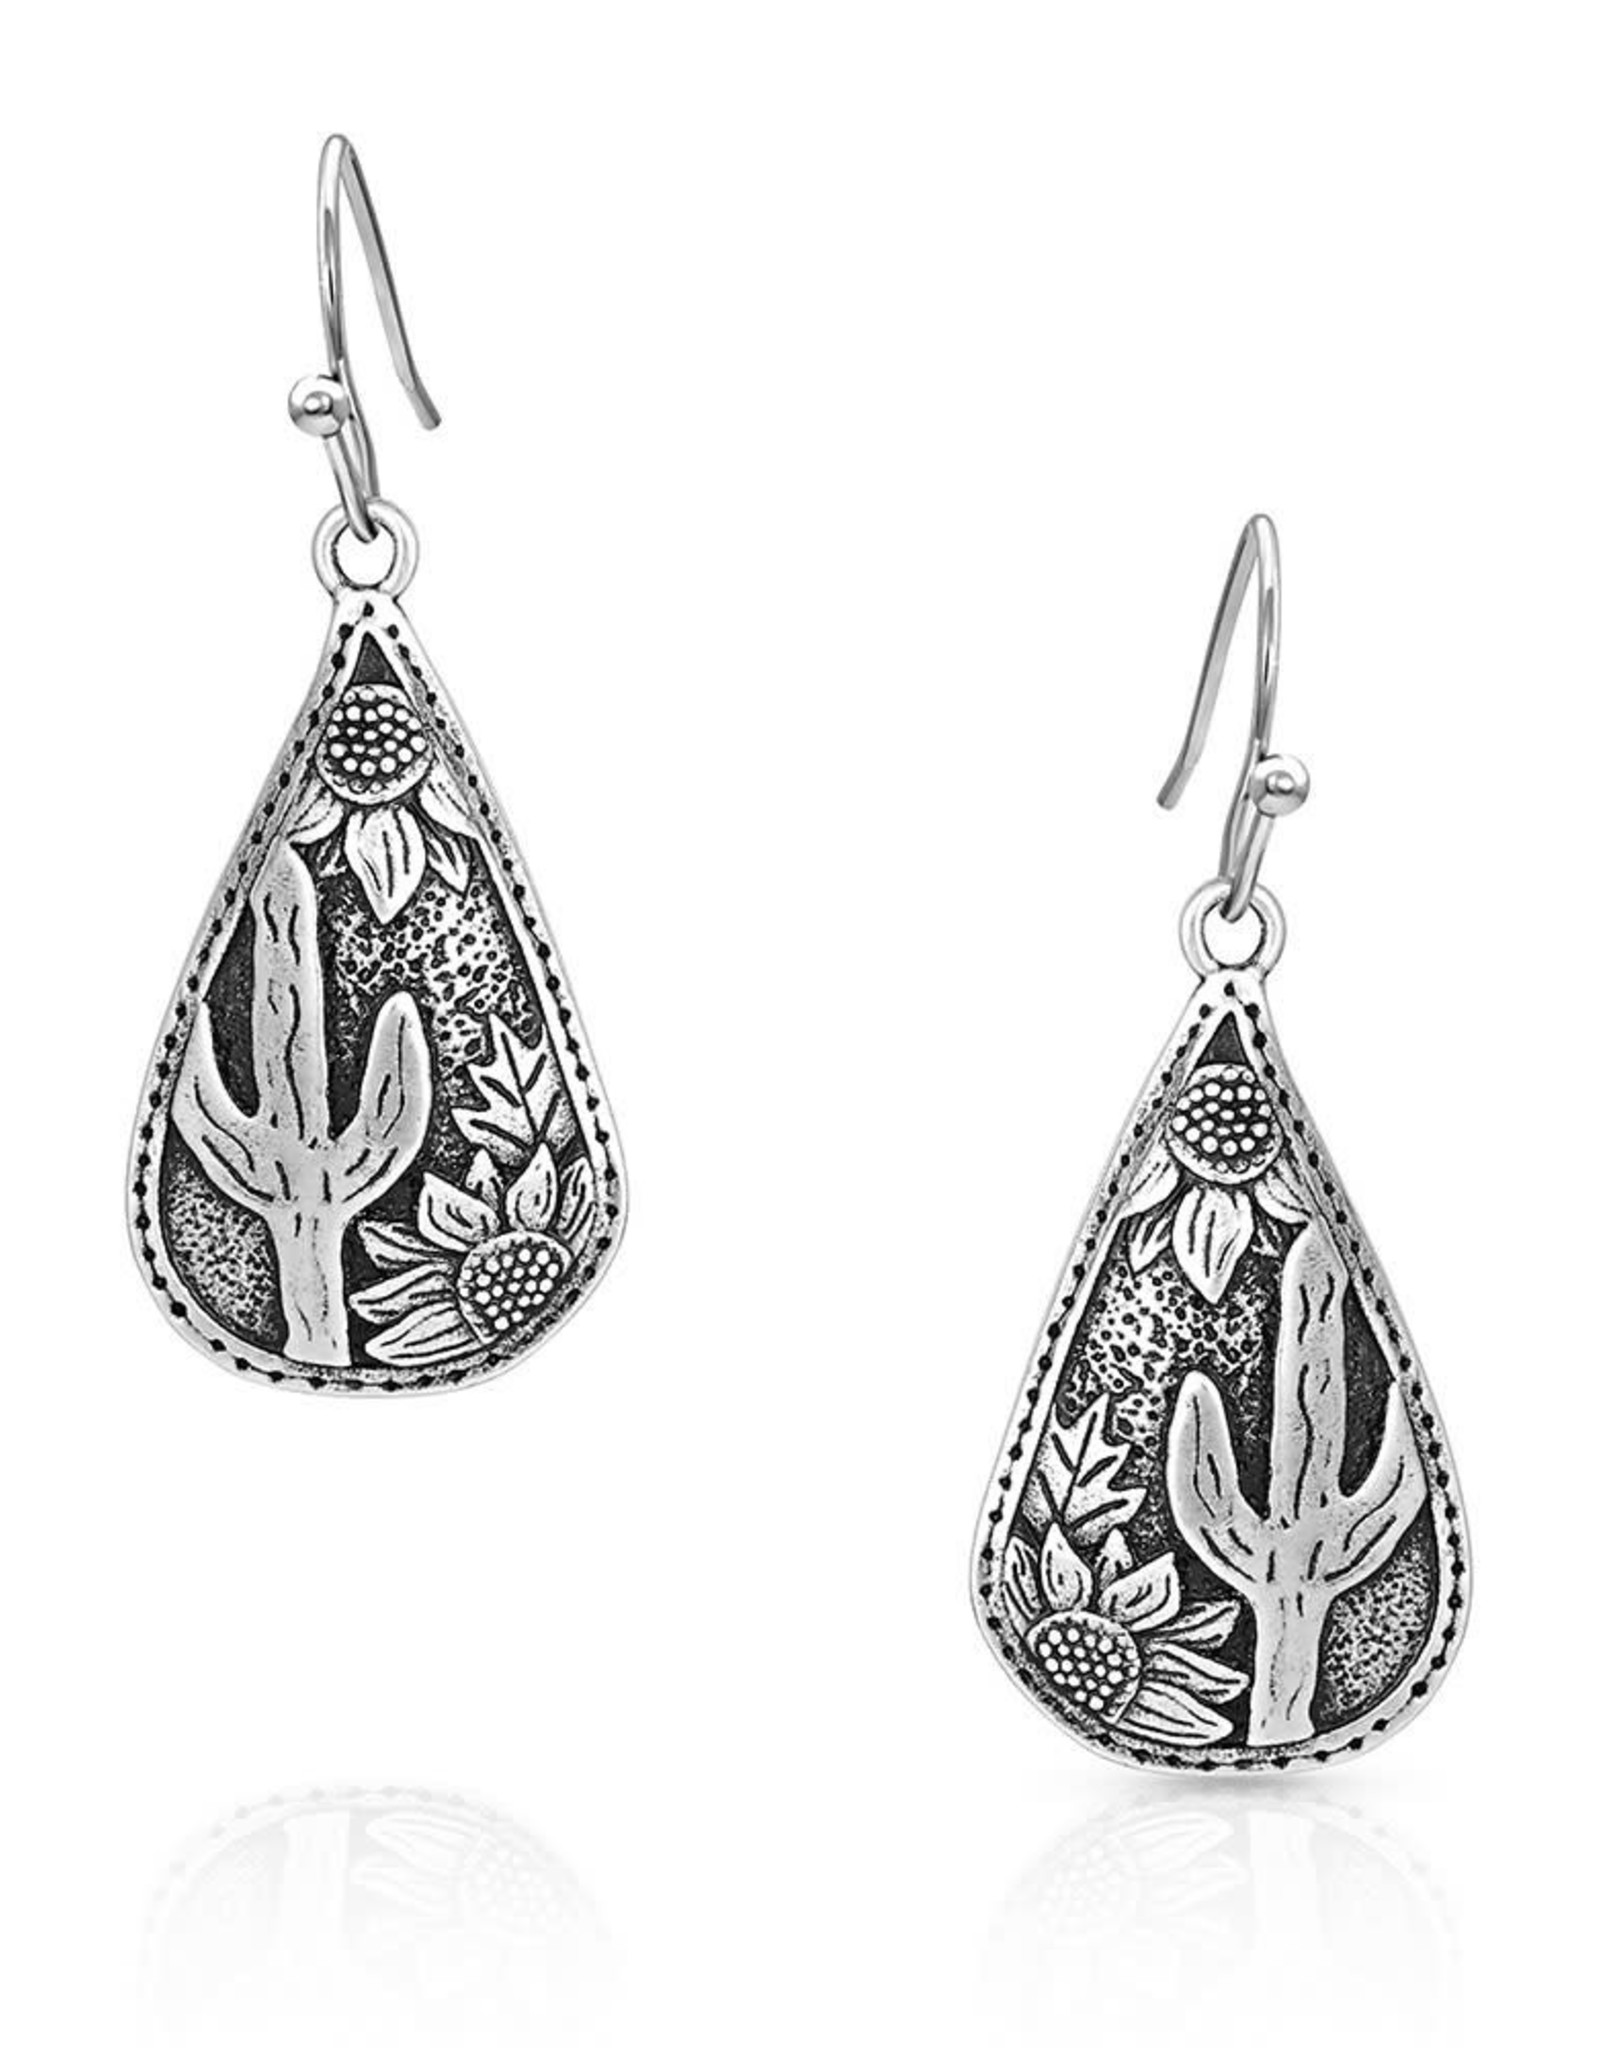 Montana Silversmiths Earrings Cradled Cactus